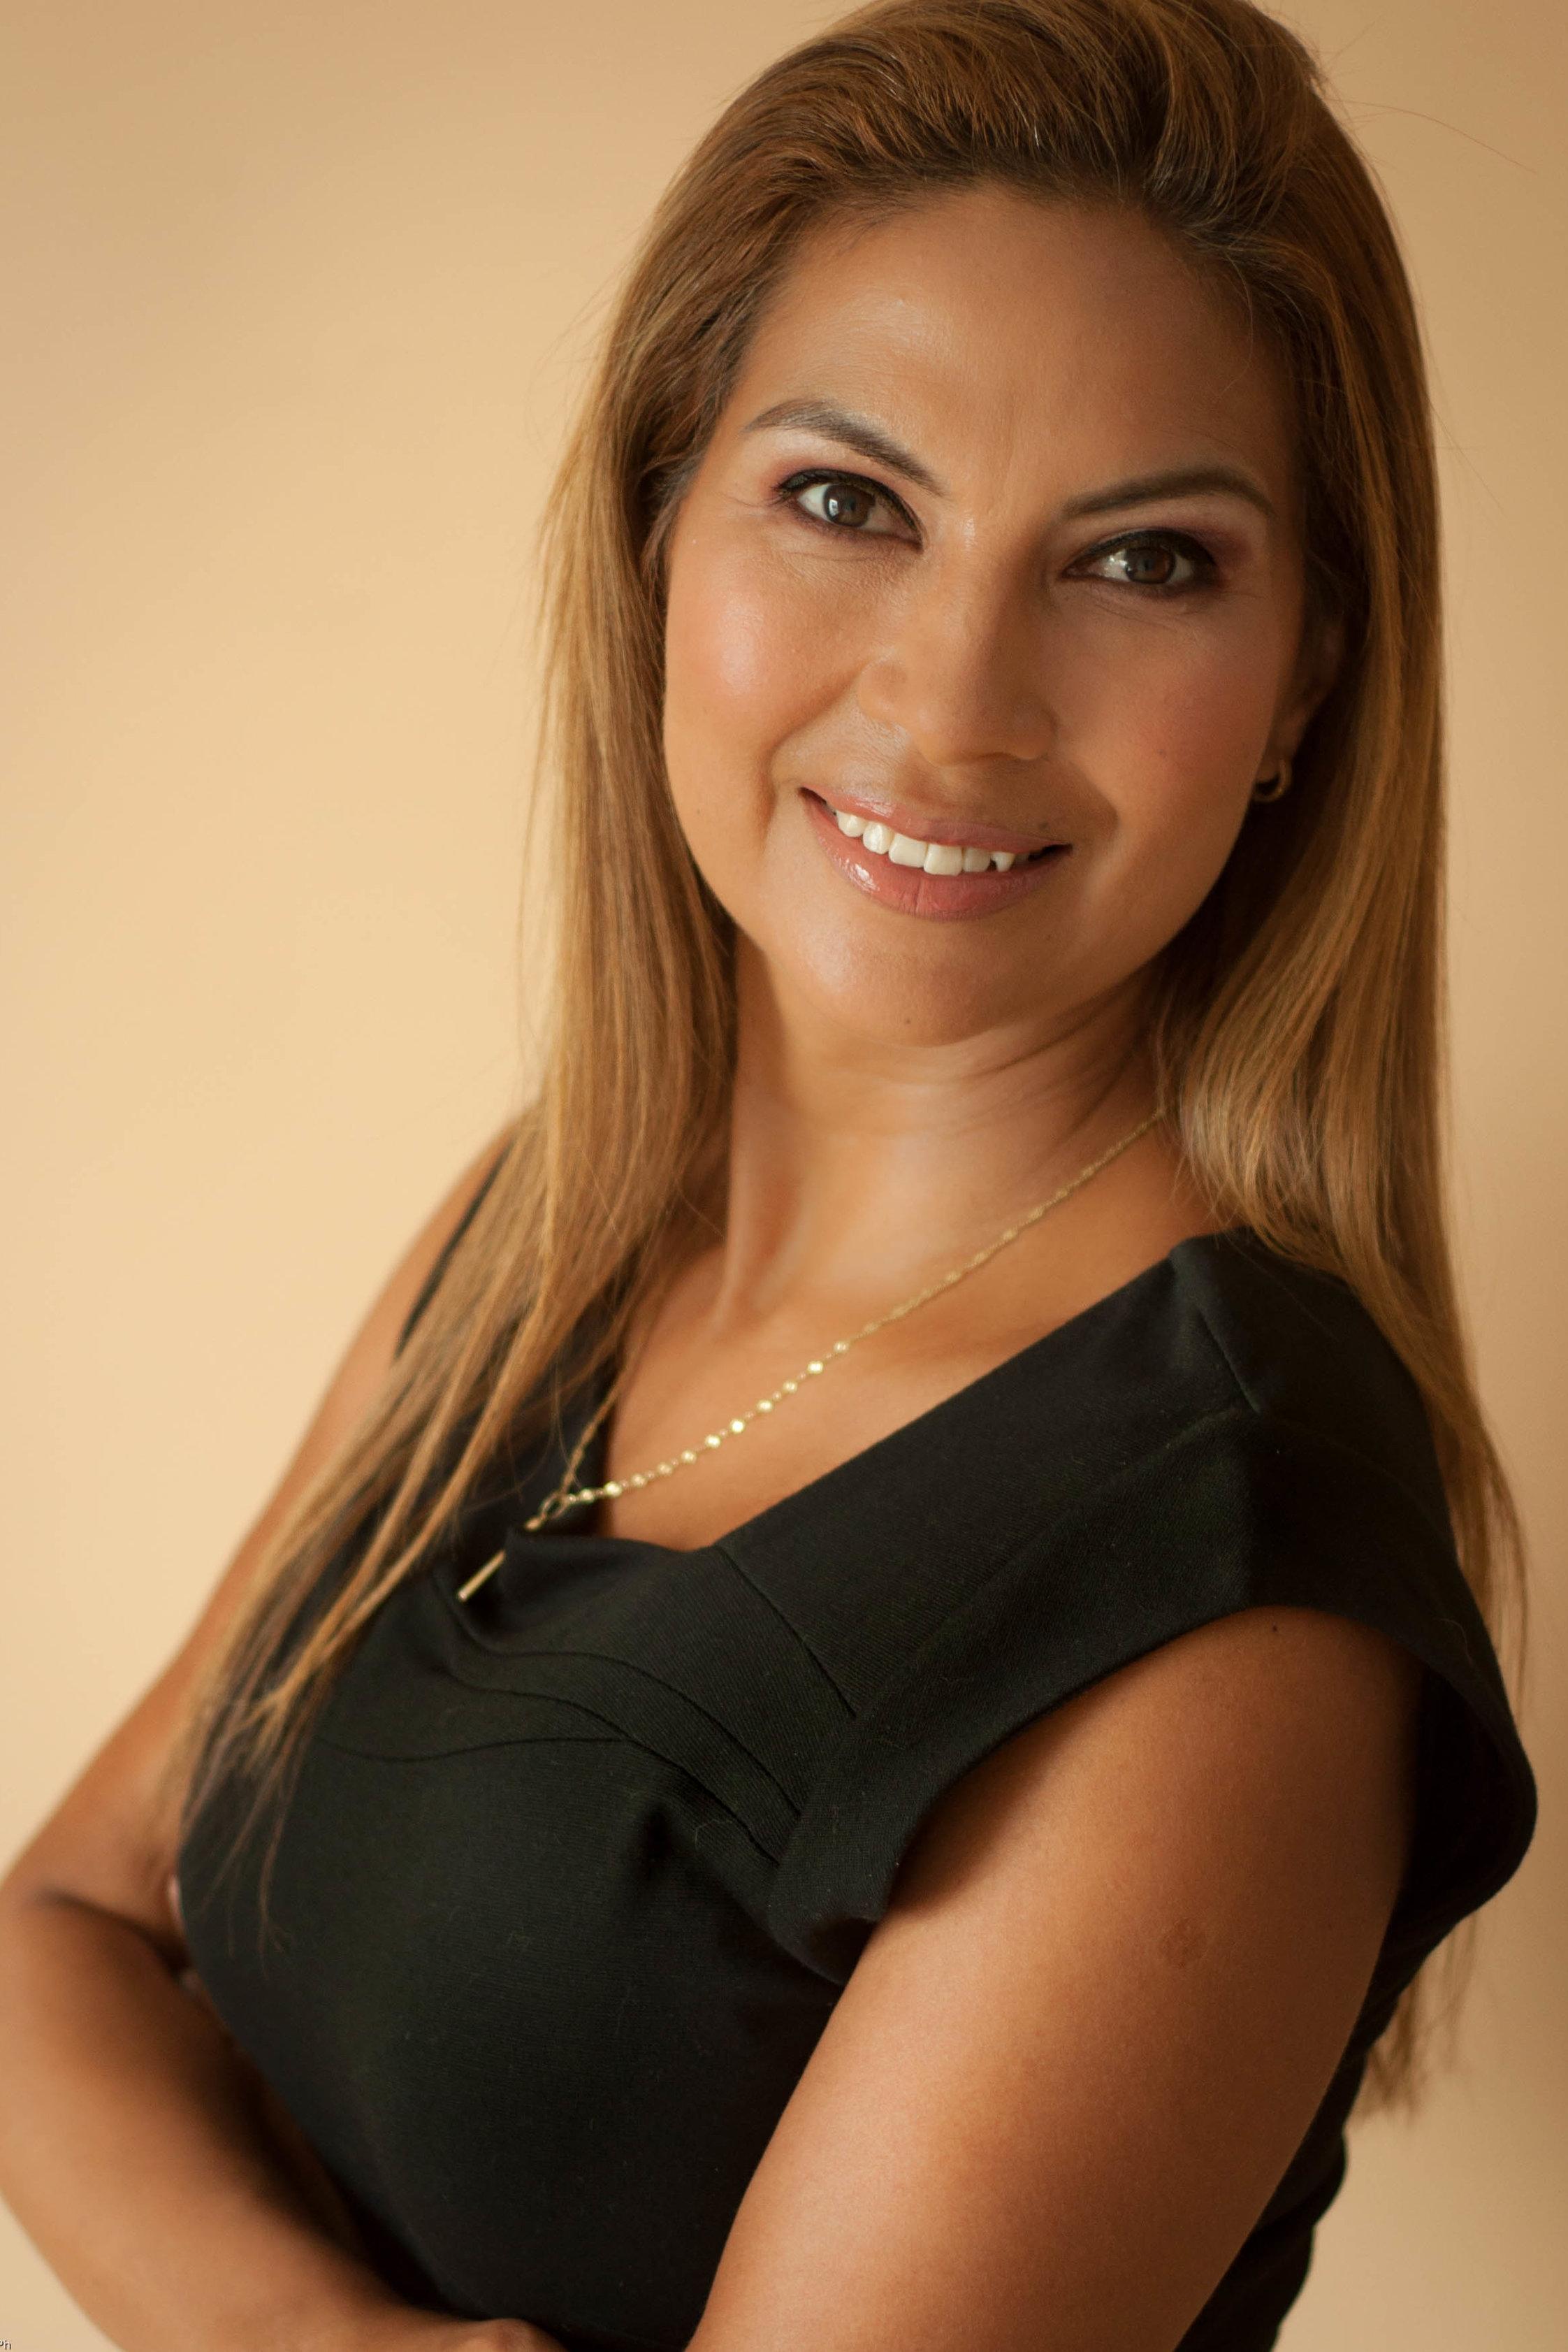 Jackie Camacho - Broker InmobiliarioIdiomas: Español / Portugués / Inglesjackie@selvacorealty.com